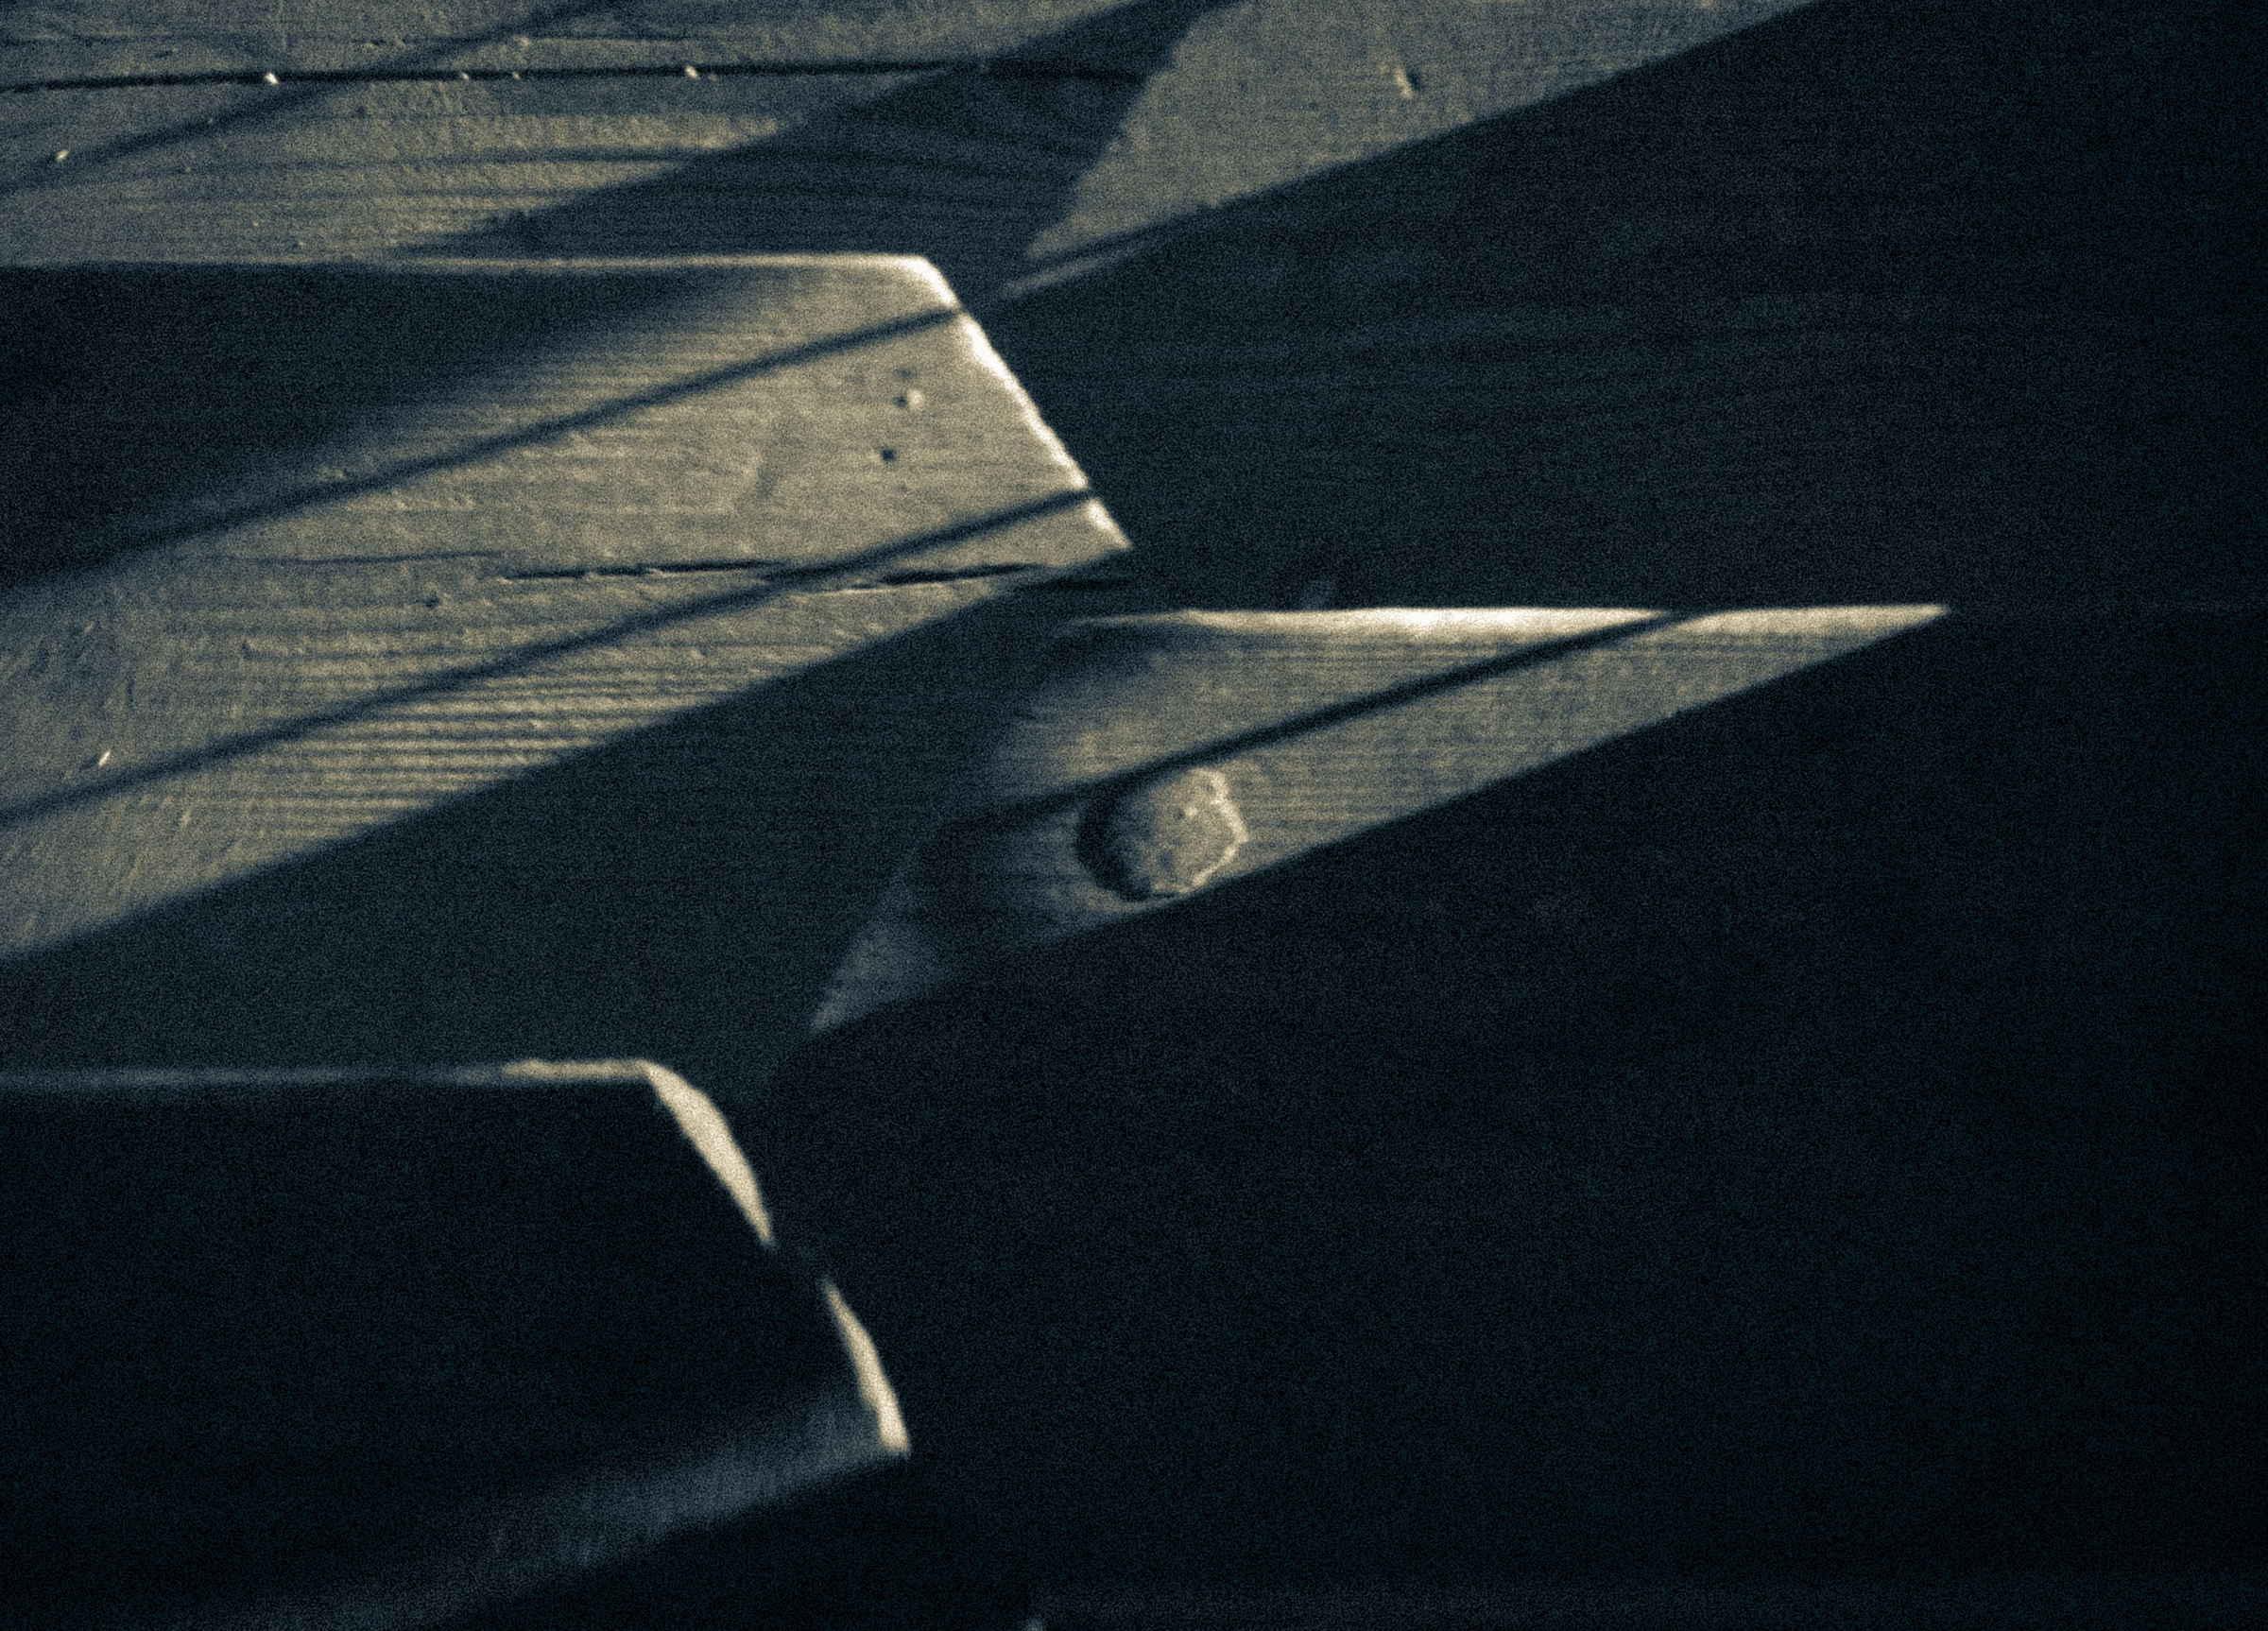 Lidija Polajžer: Stairway to heaven